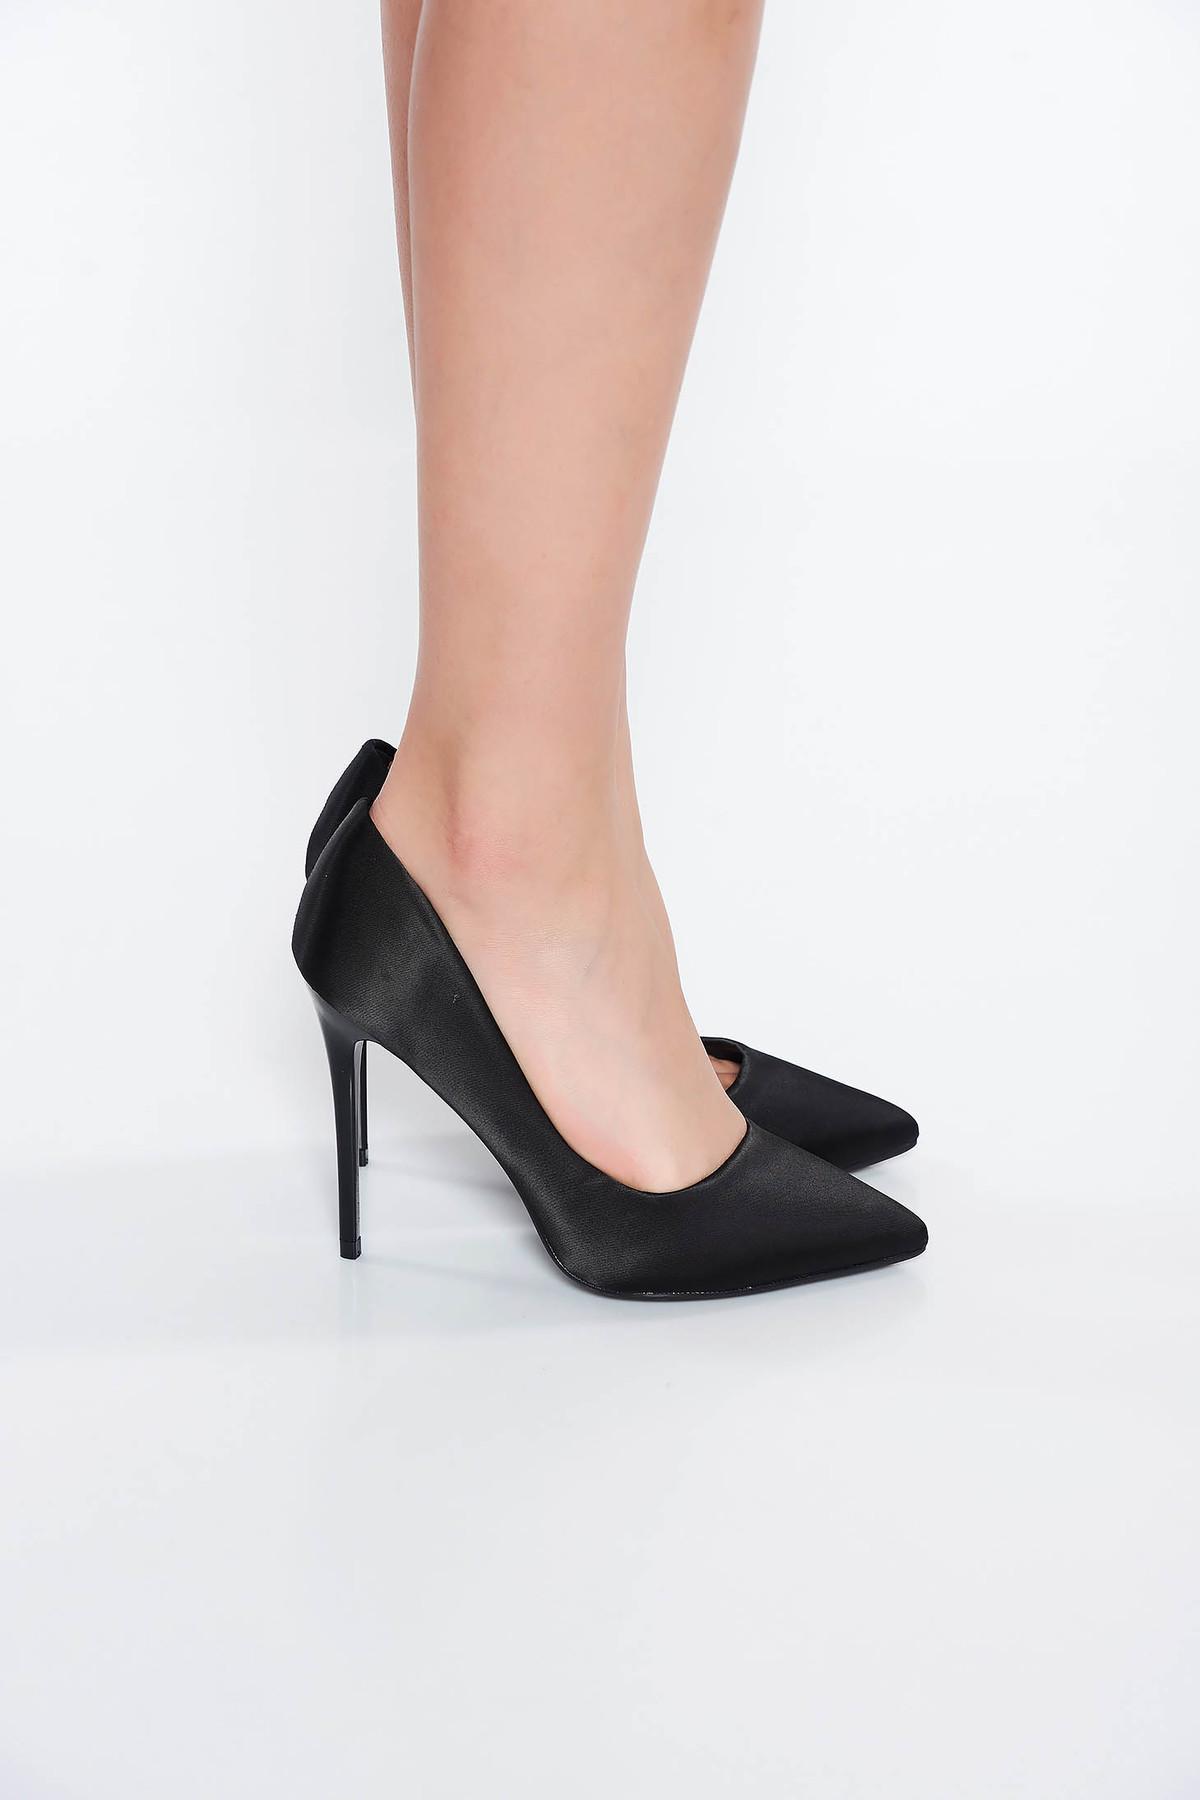 Pantofi negru elegant cu toc inalt din material satinat cu varful usor ascutit